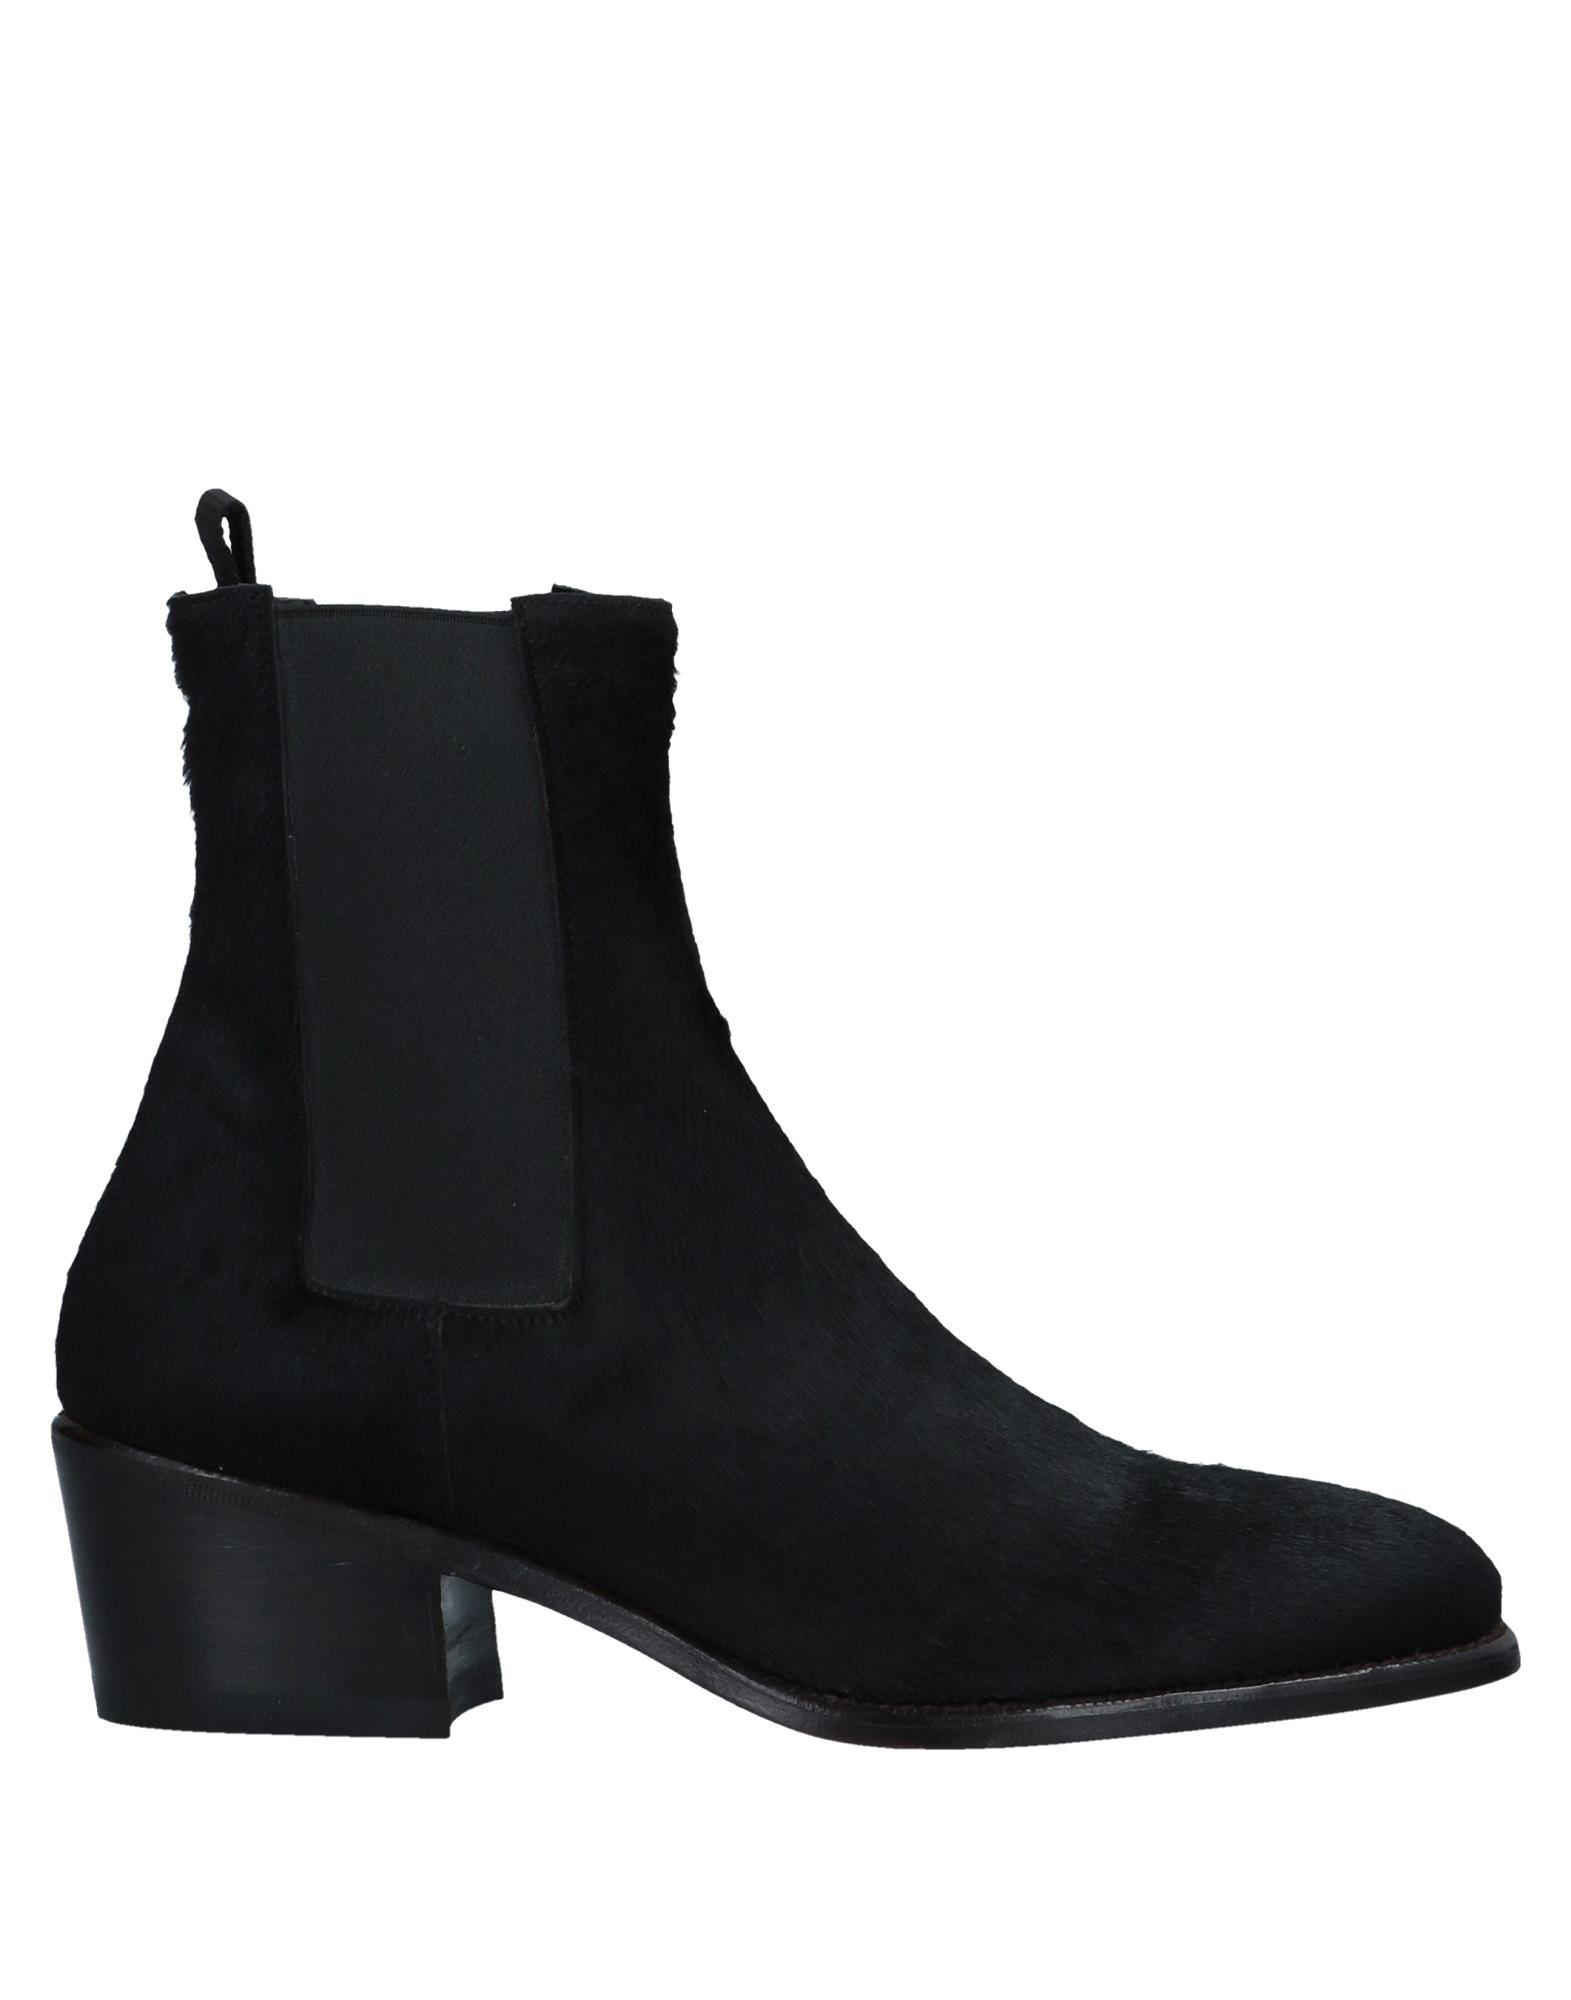 Rabatt Schuhe Premiata 11530778IE Chelsea Boots Damen  11530778IE Premiata 535b2a